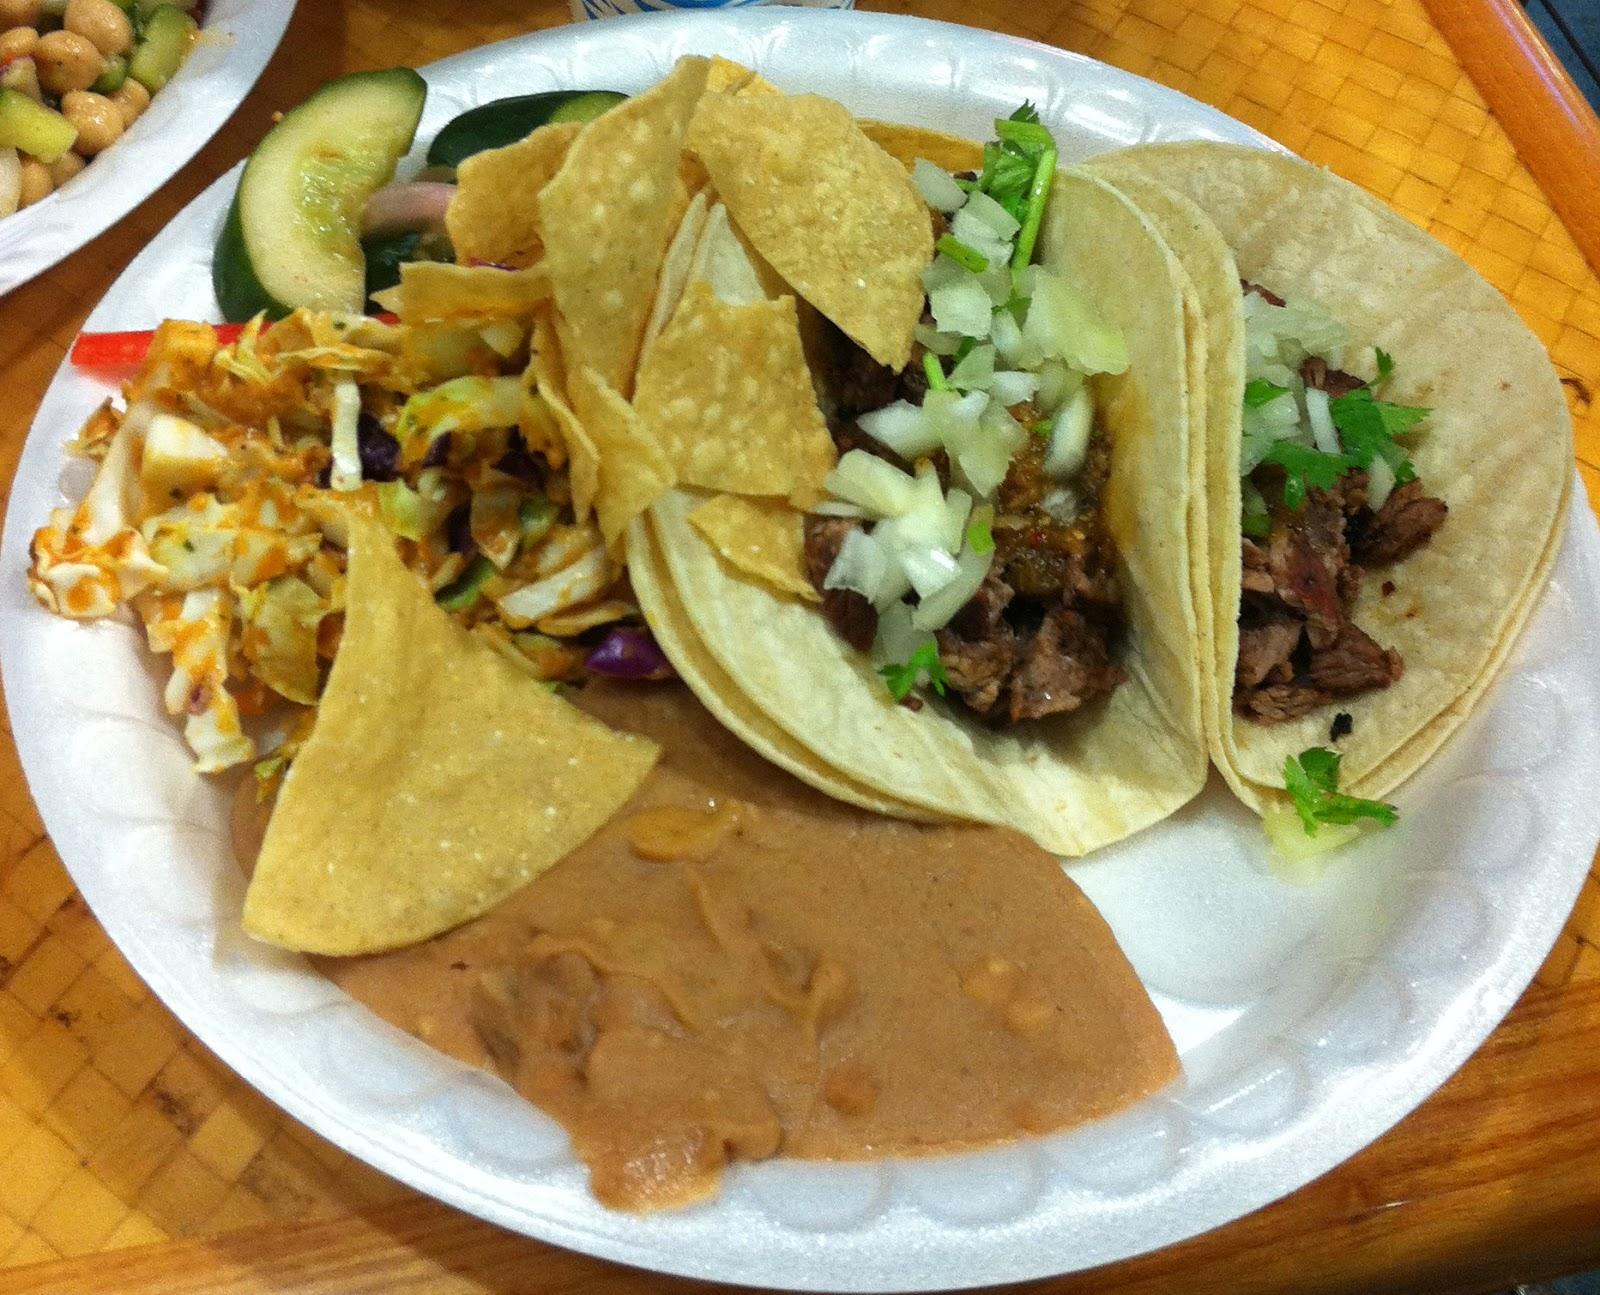 TASTE OF HAWAII: ALA MOANA FOOD COURT - SENOR PEPE' AND SBARRO